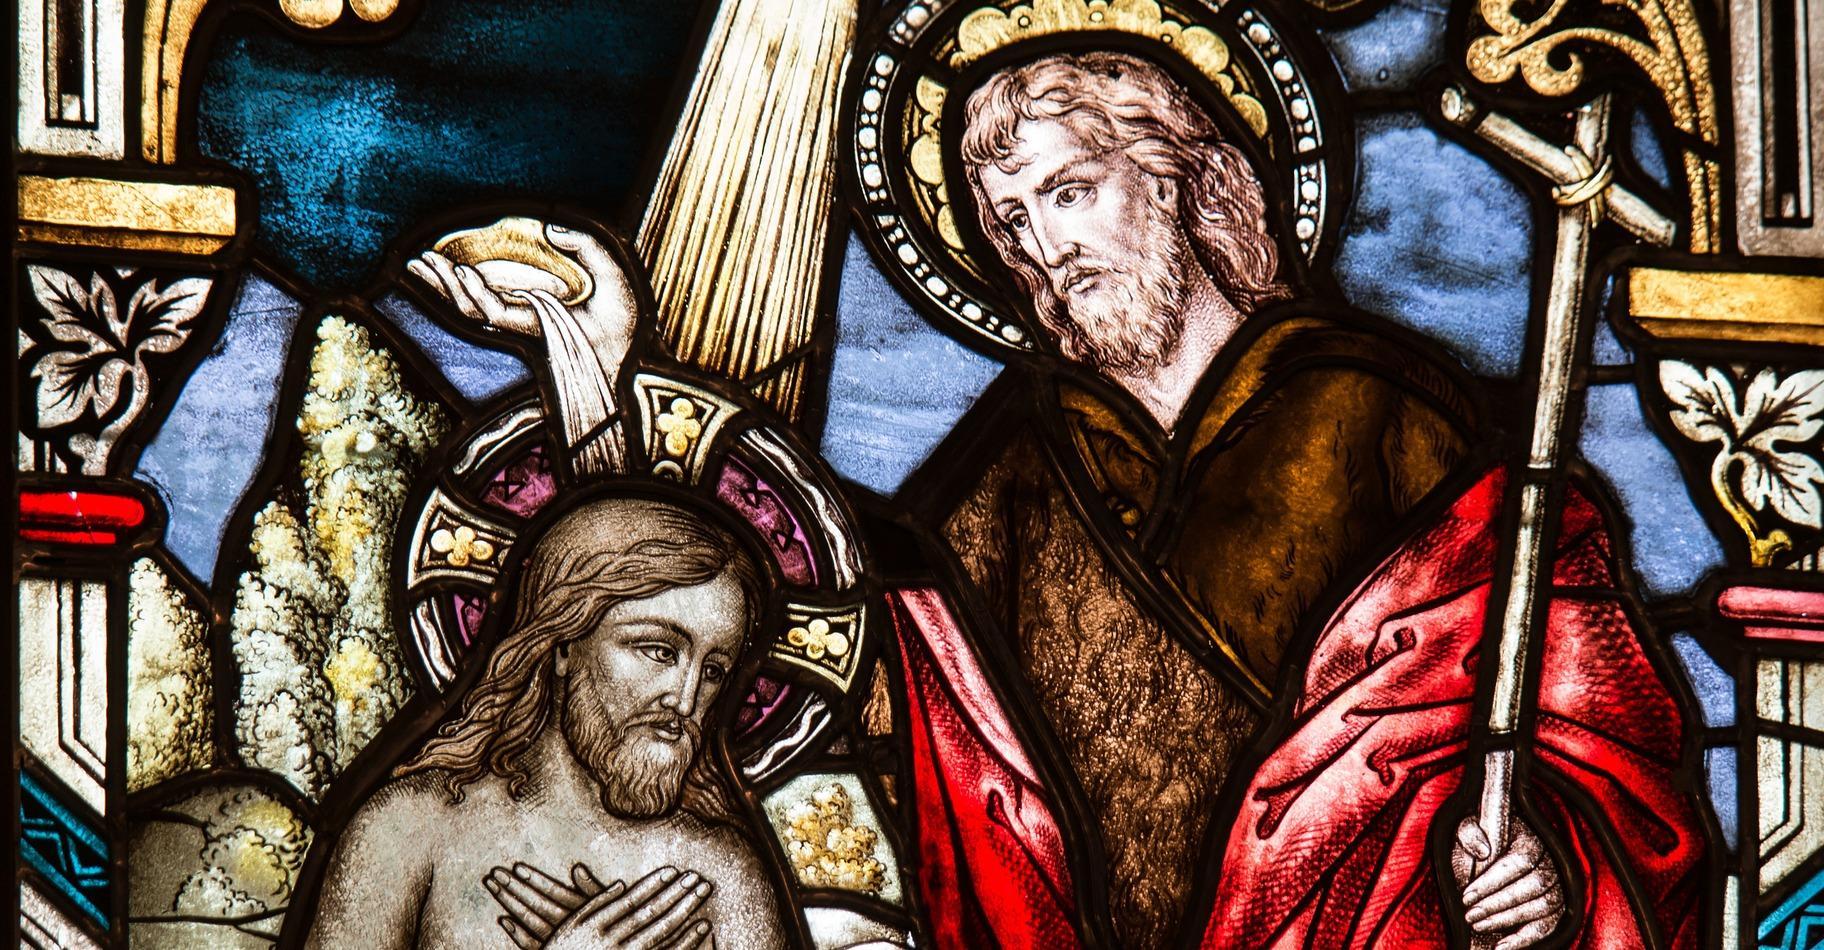 church-window-1016443_1920